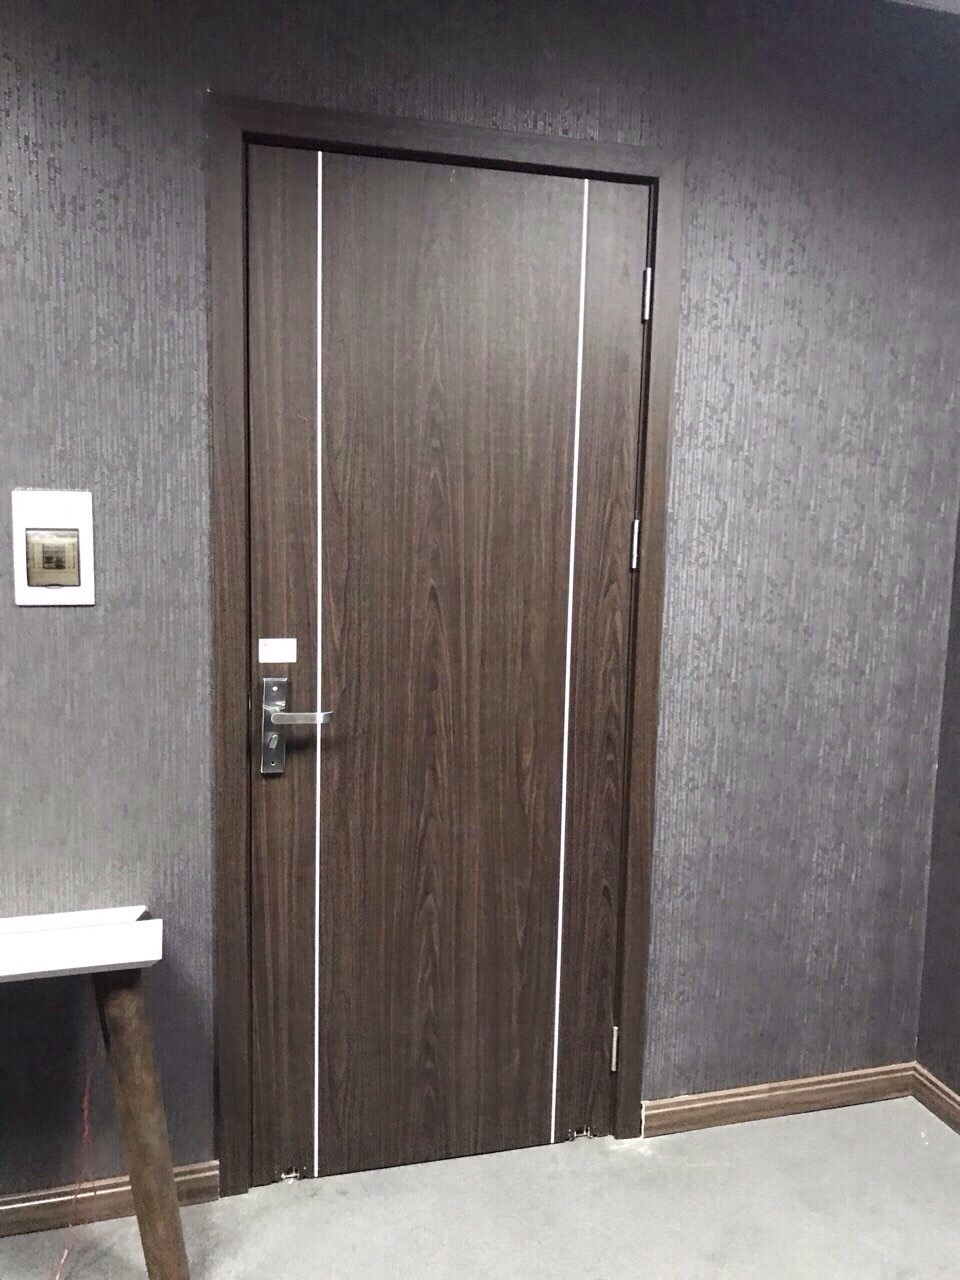 Cửa nhựa composite Hàn Quốc phòng WC